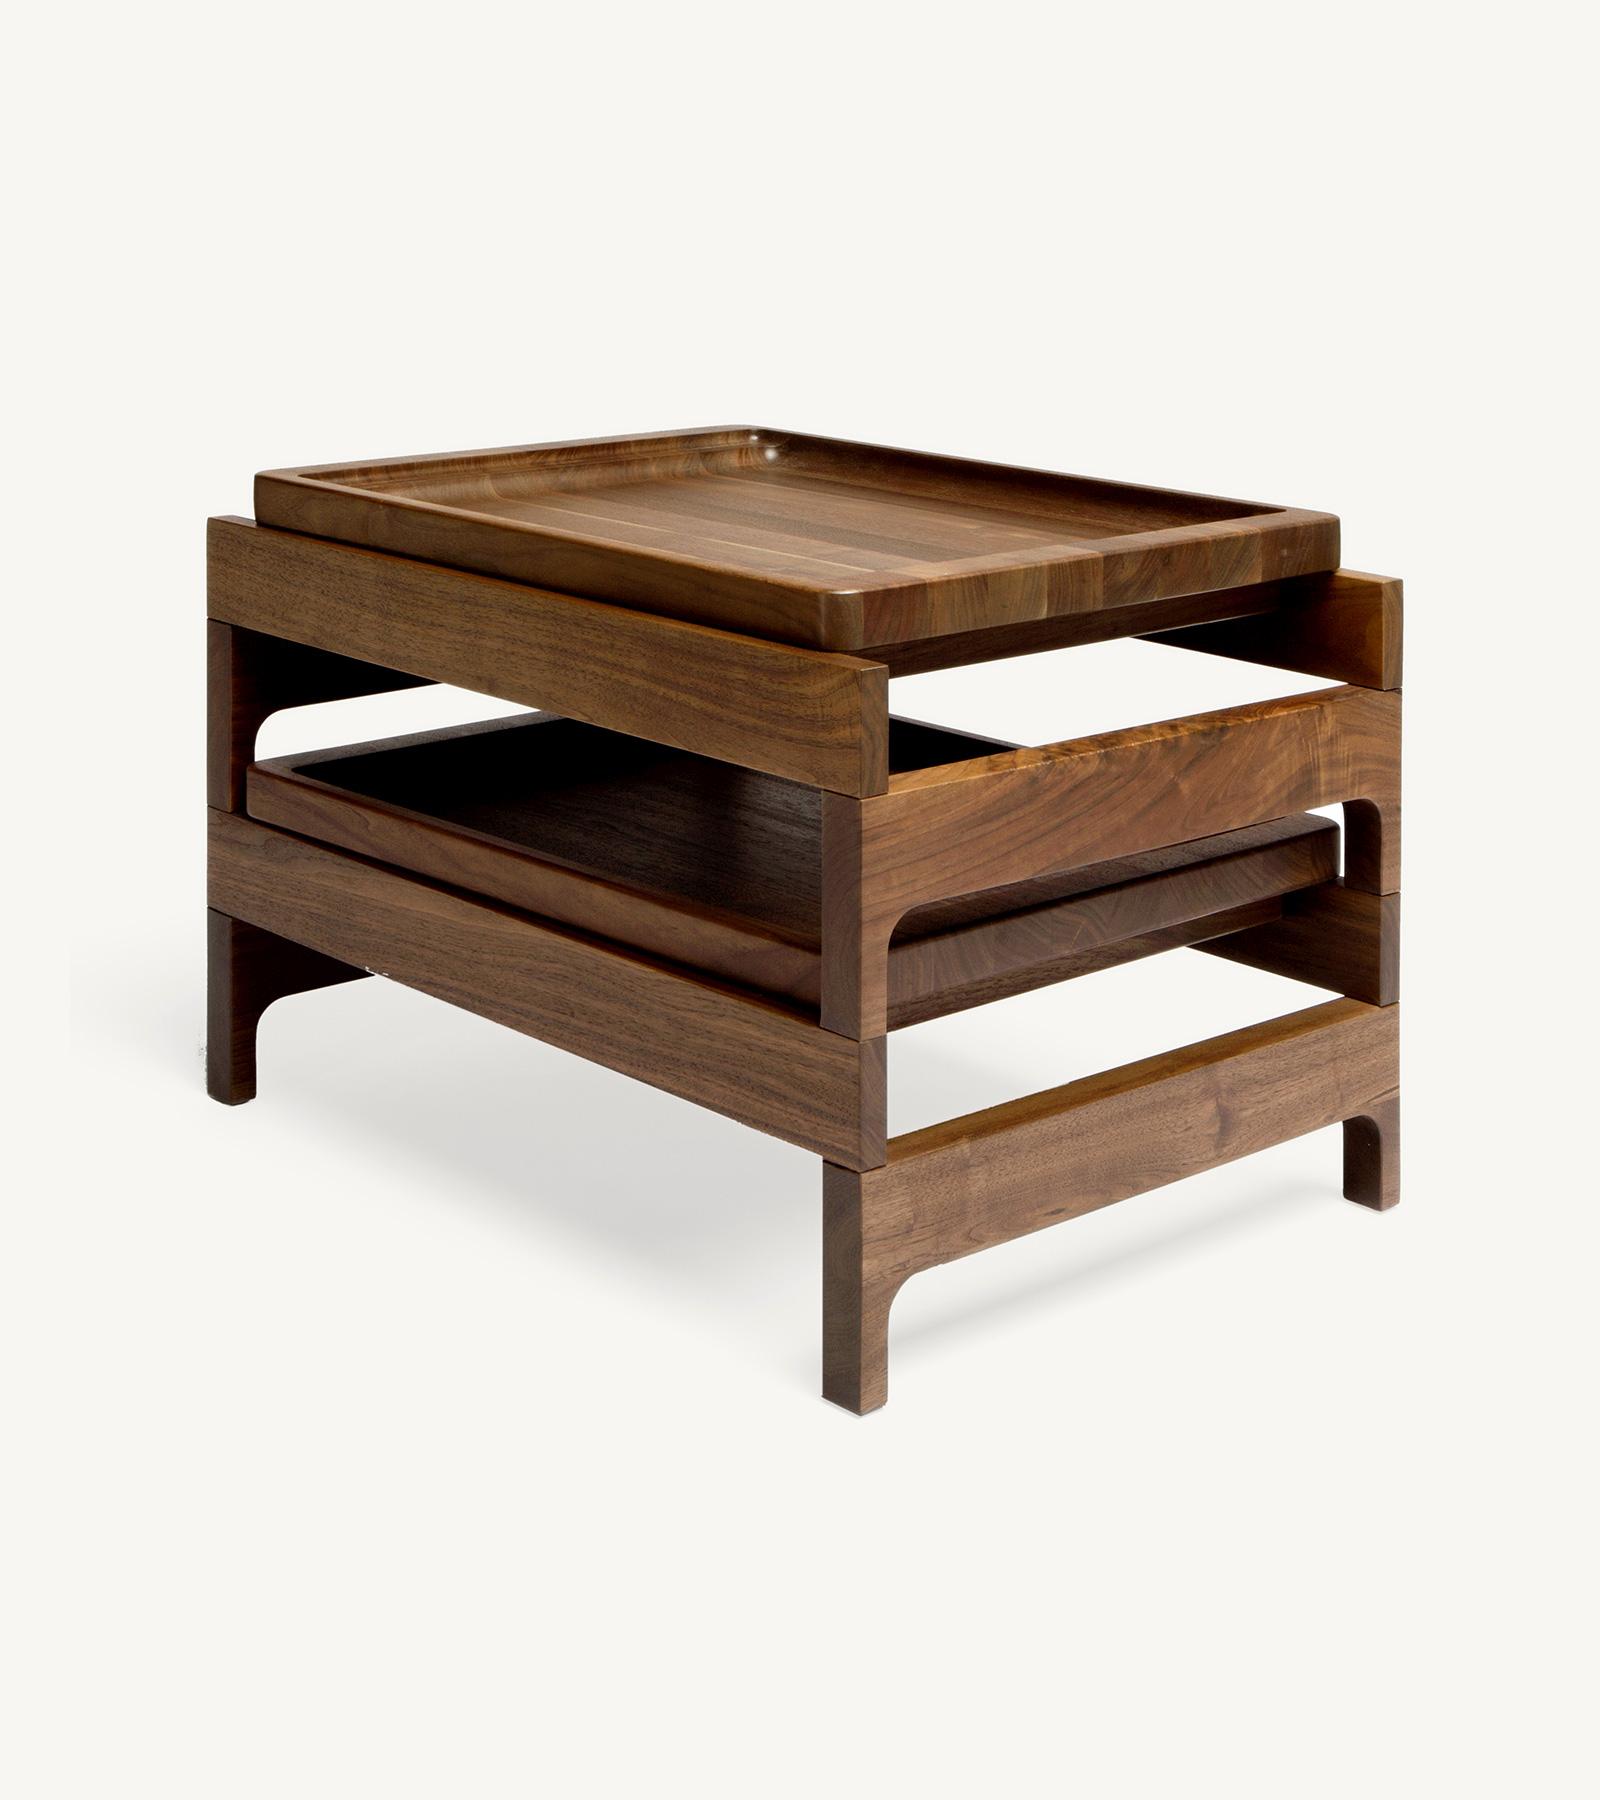 TinnappleMetz-bassamfellows-Tray-Rack-Side-Table-01